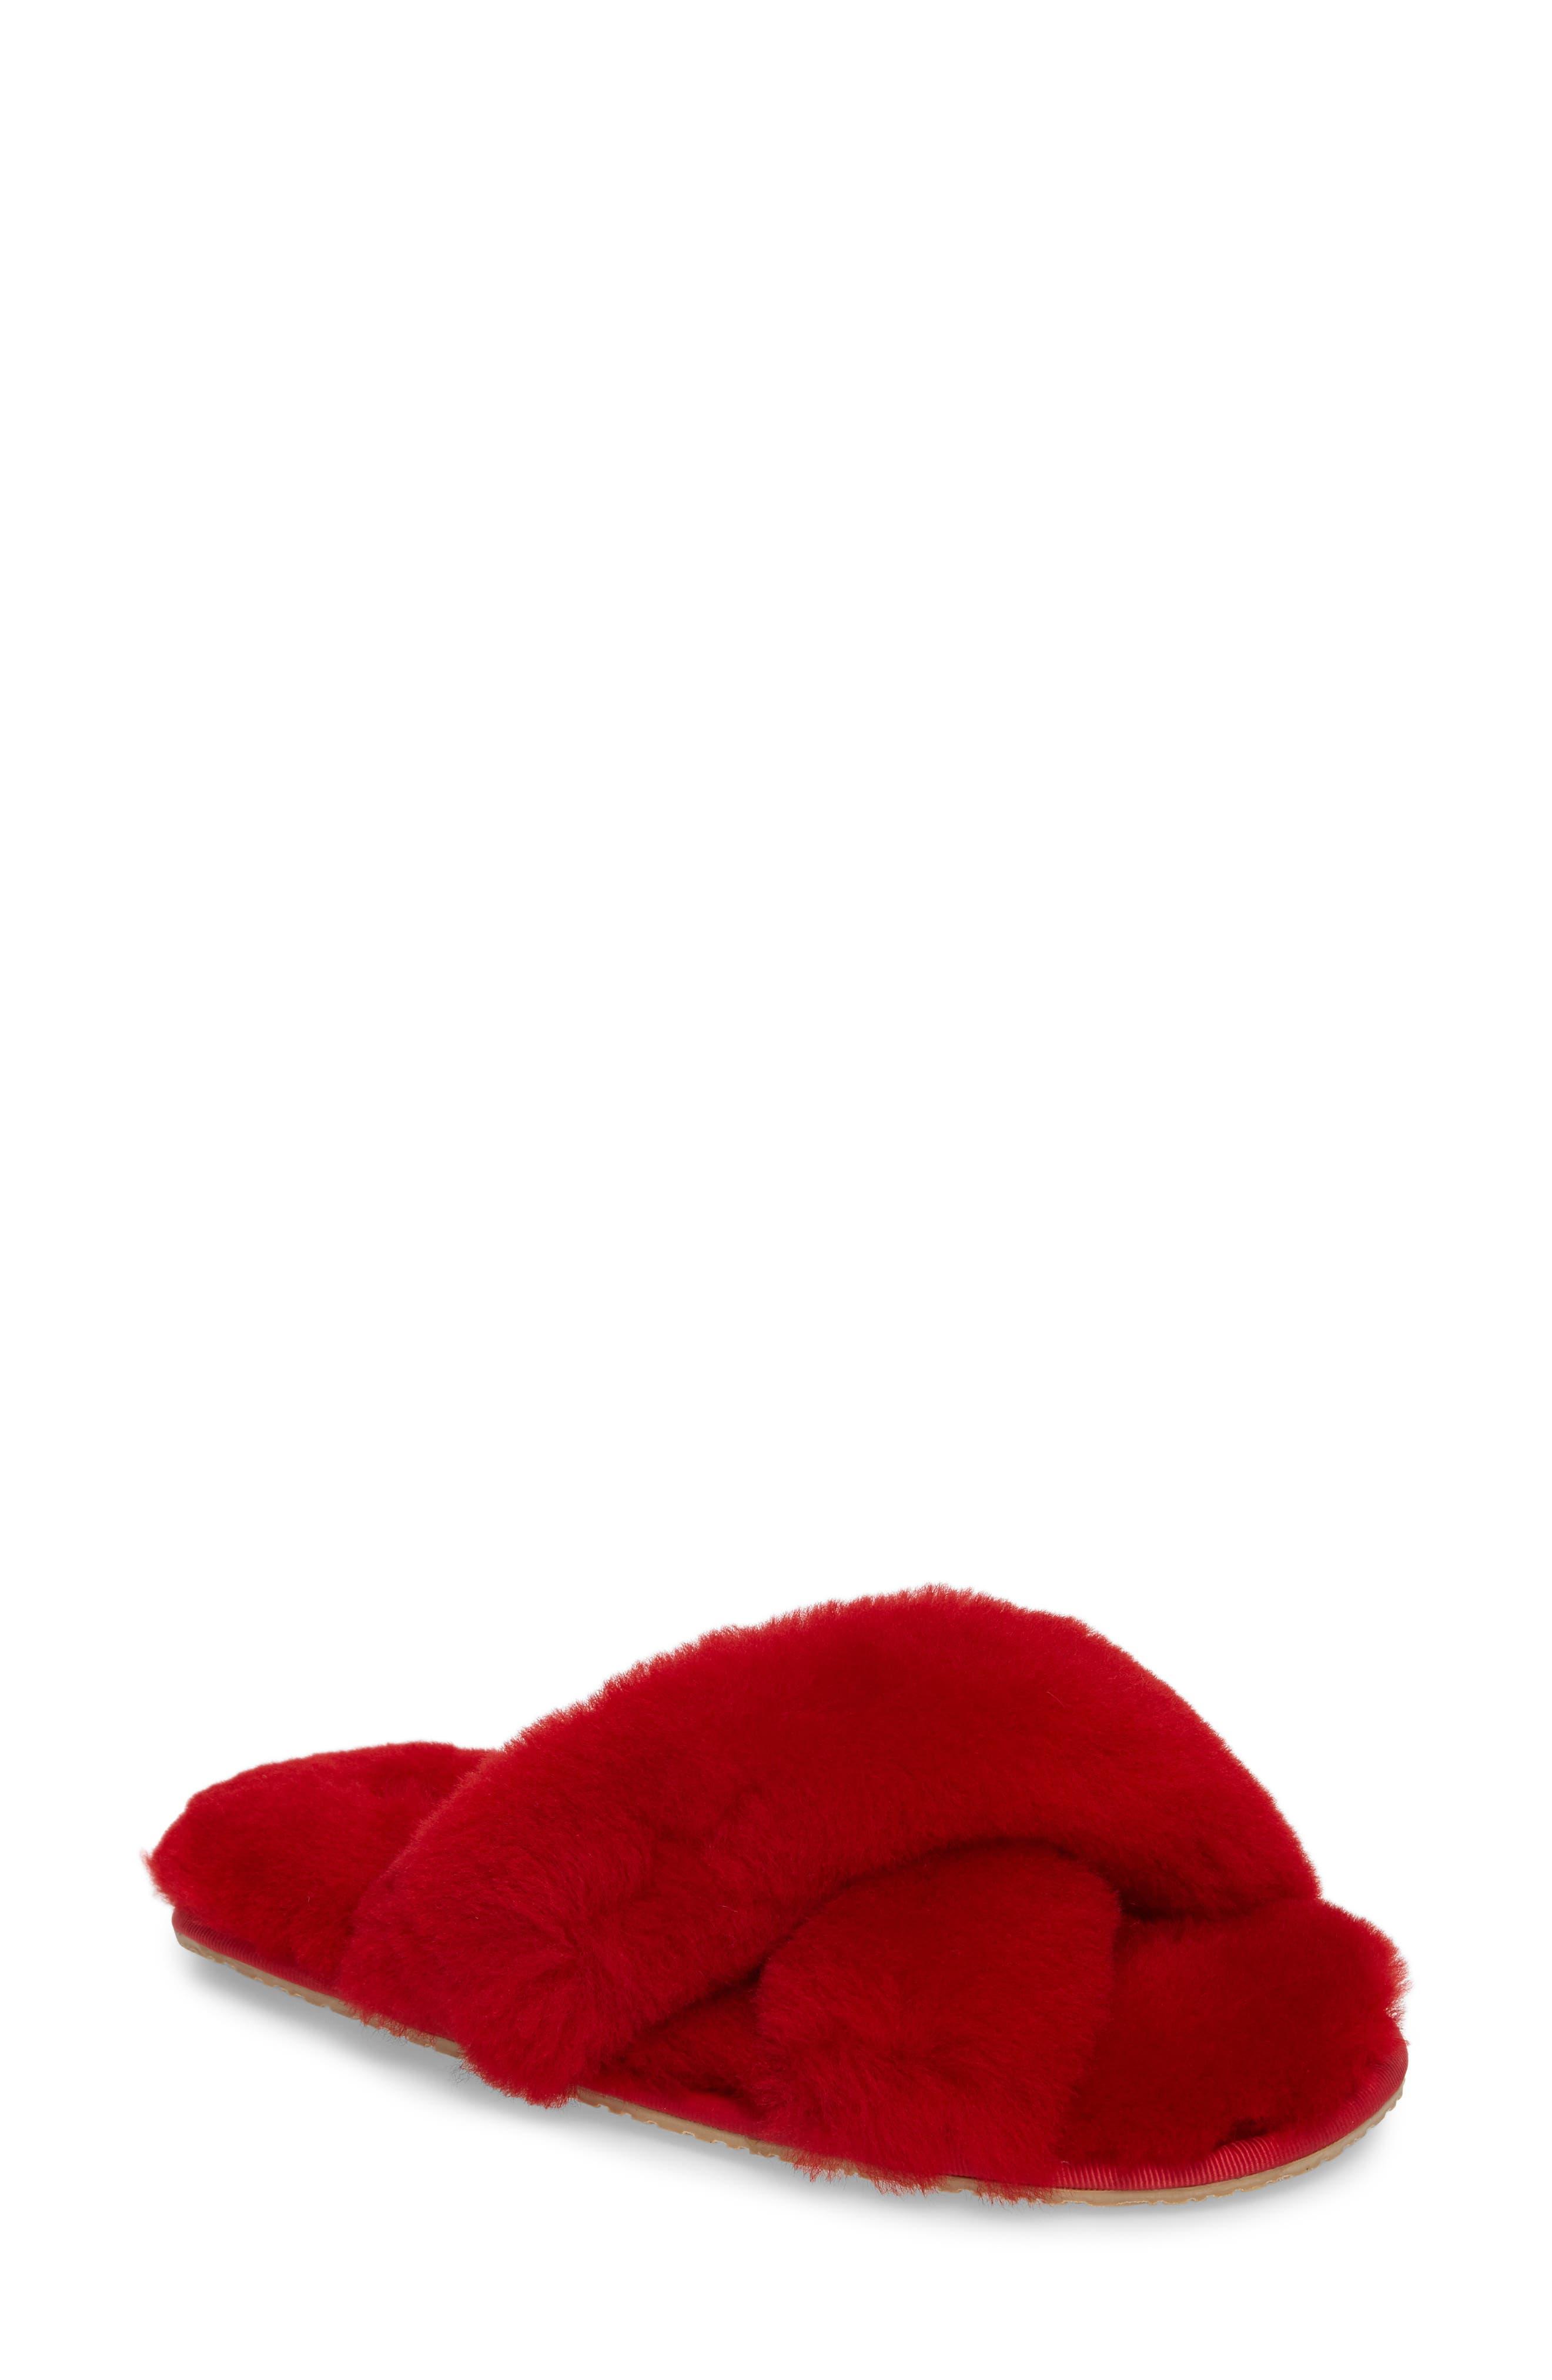 PATRICIA GREEN, Mt. Hood Genuine Shearling Slipper, Main thumbnail 1, color, RED